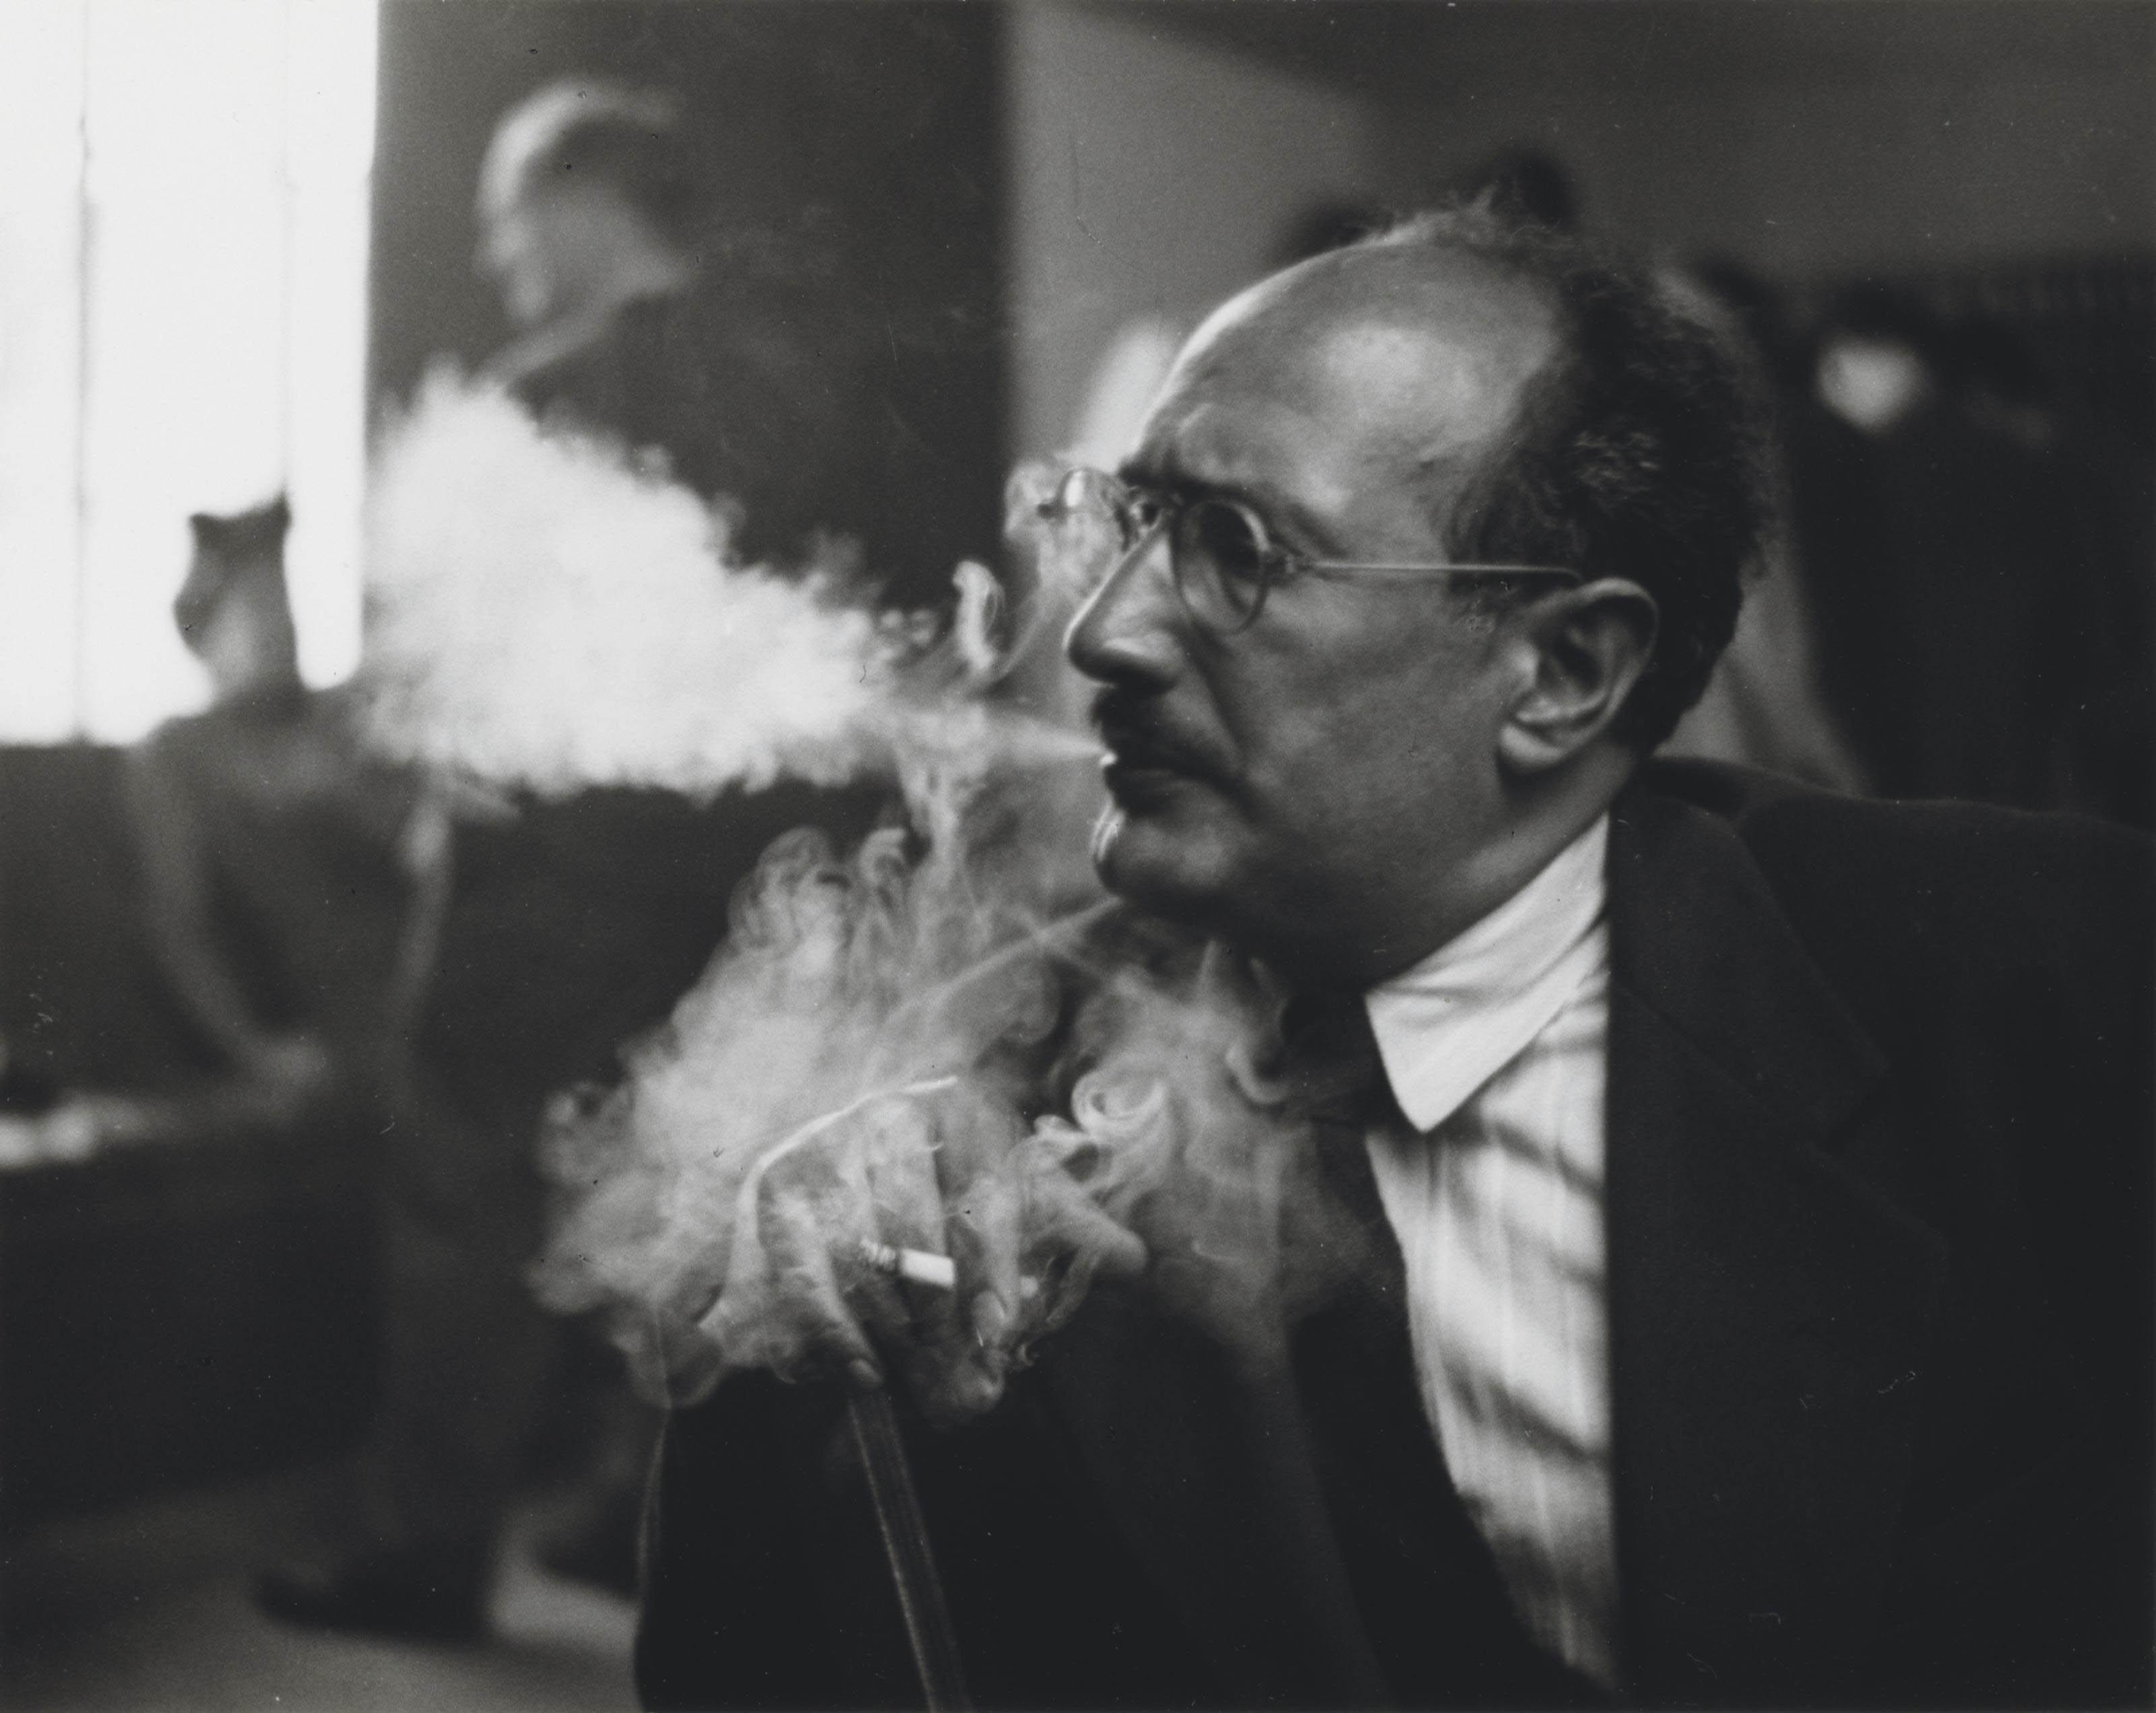 Mark Rothko, California School of Fine Arts, 1949-1950